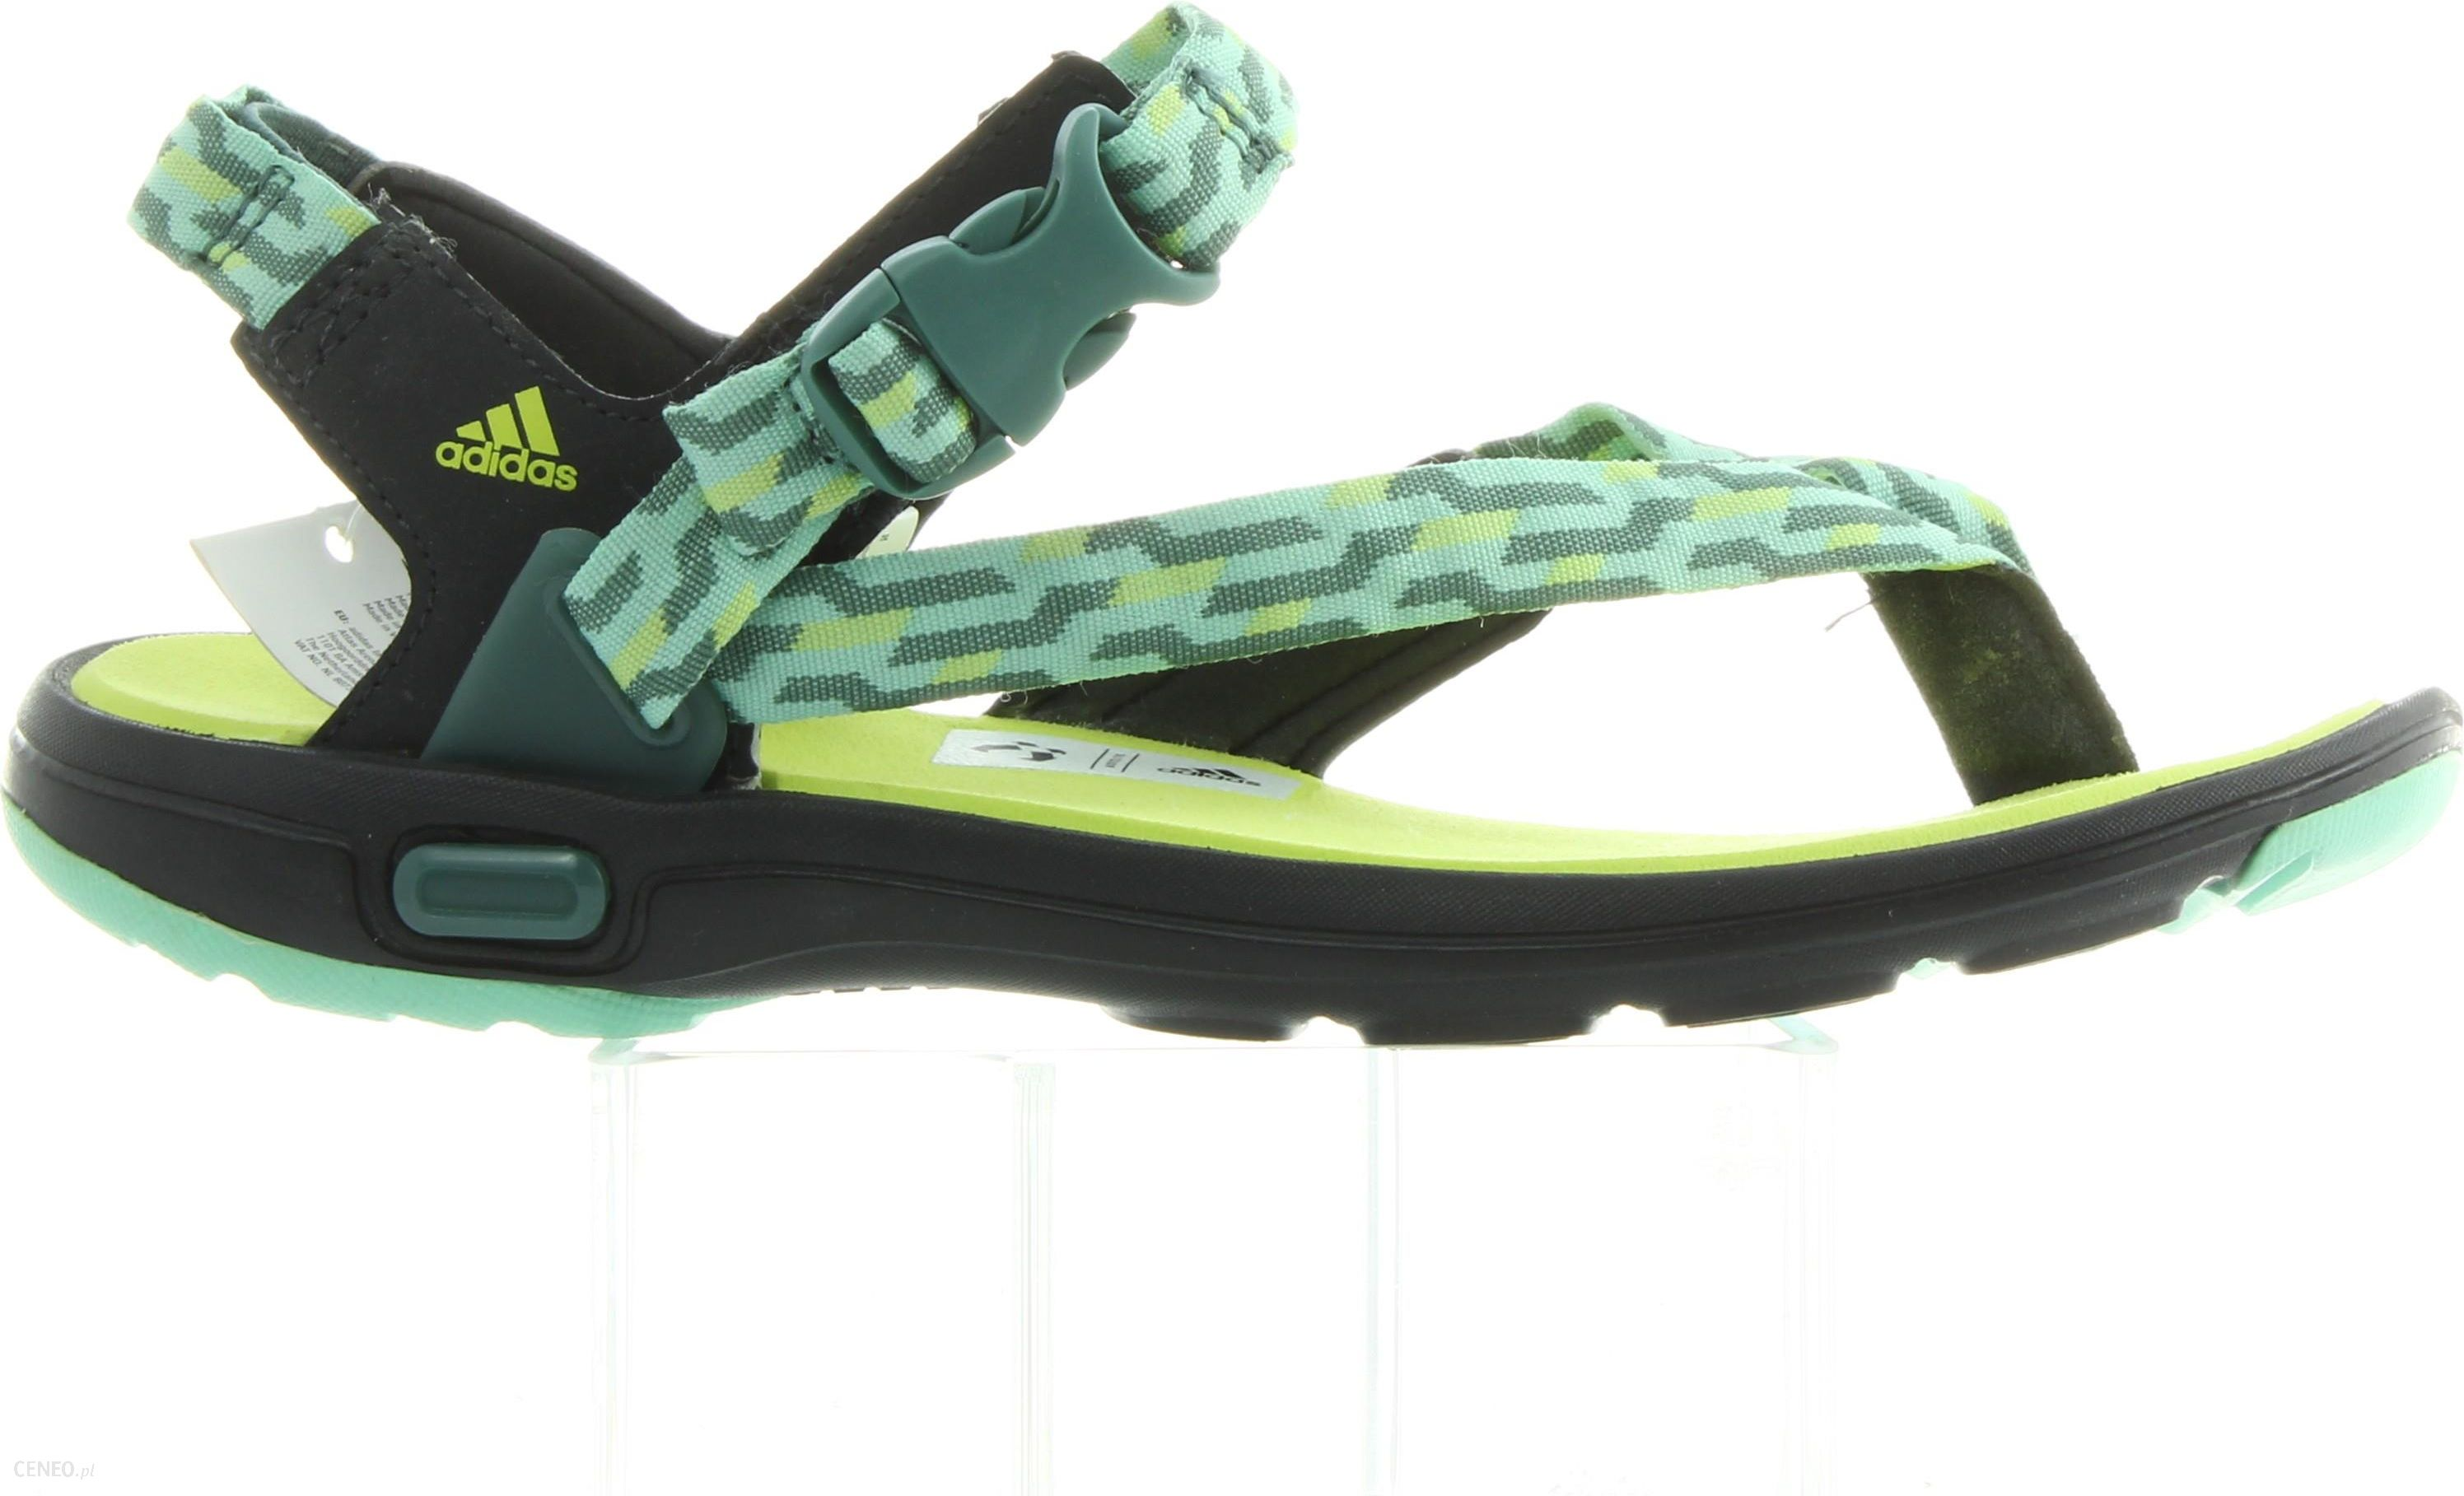 Adidas Libria Sandal LT